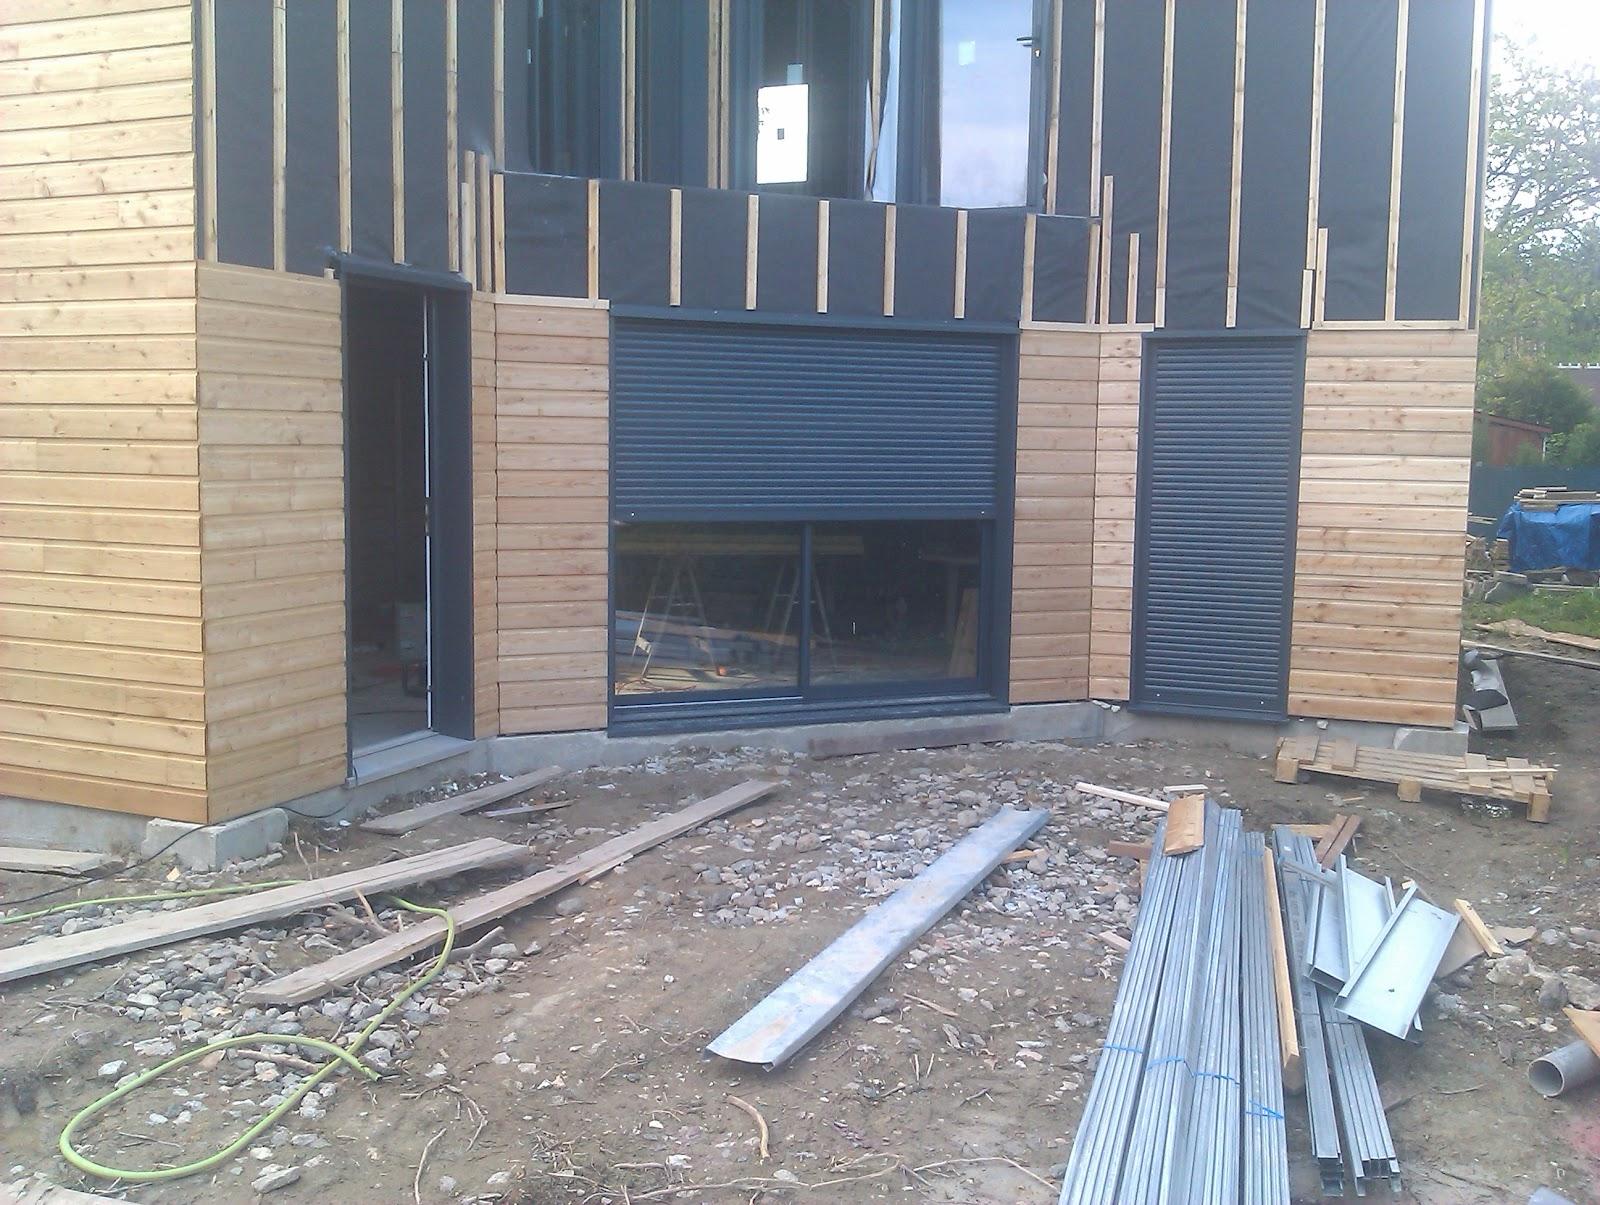 Construction maison ossature m tallique bardage ext rieur - Bardage metallique maison ...